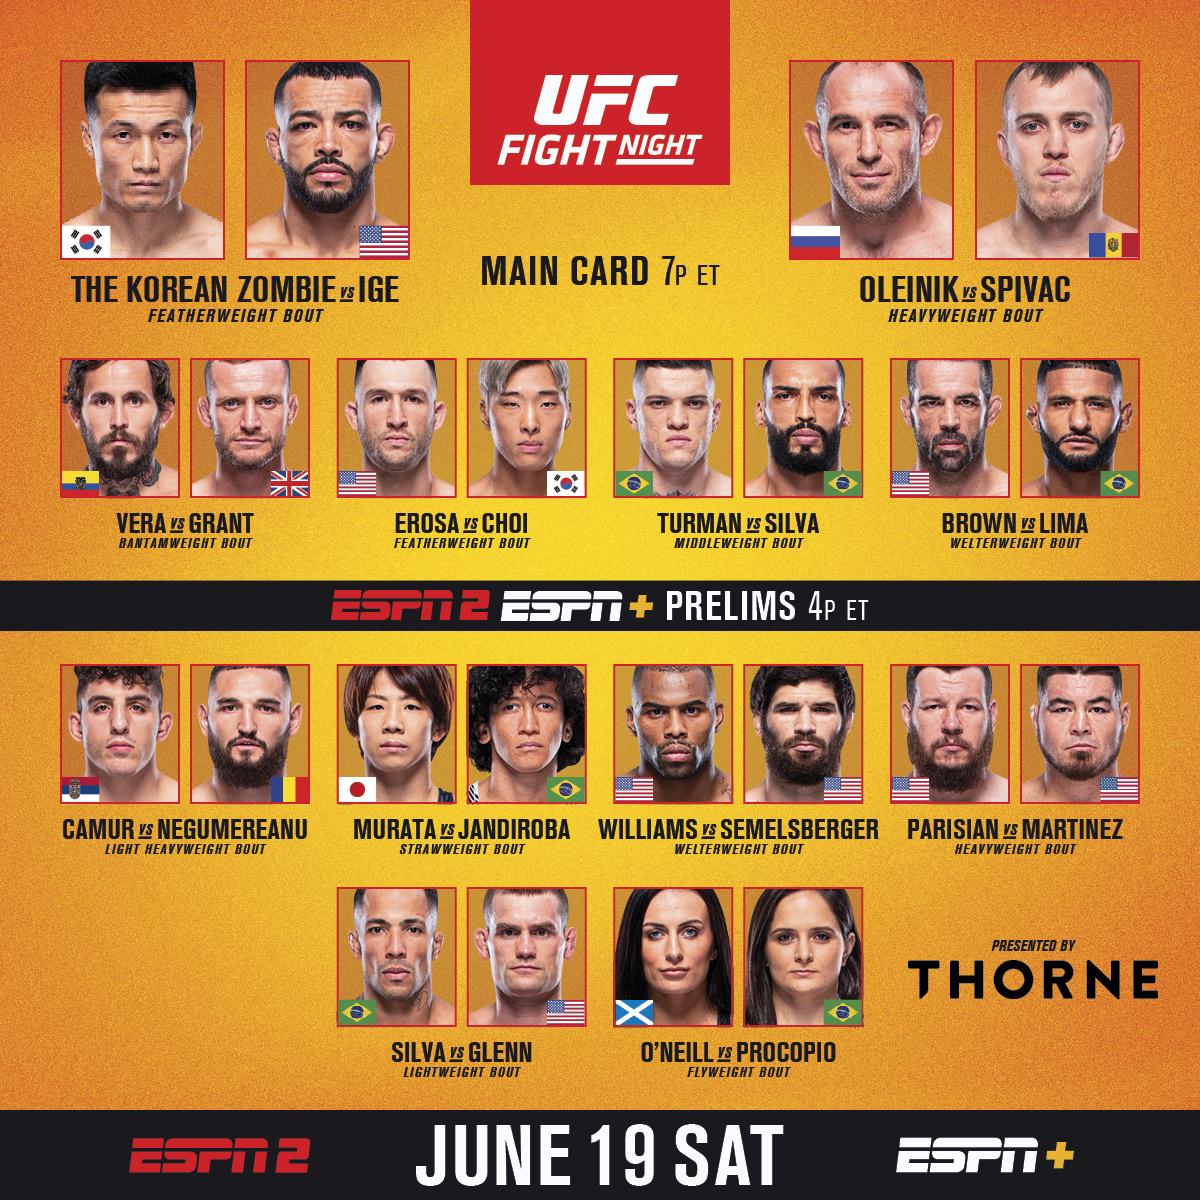 We got a featherweight banger headlining one exciting card 🍿  Prelims kick off at 4pmET on ESPN2 & @ESPNPlus!   [ #UFCVegas29 | B2YB @ThorneHealth ] https://t.co/piVIrVNNAT